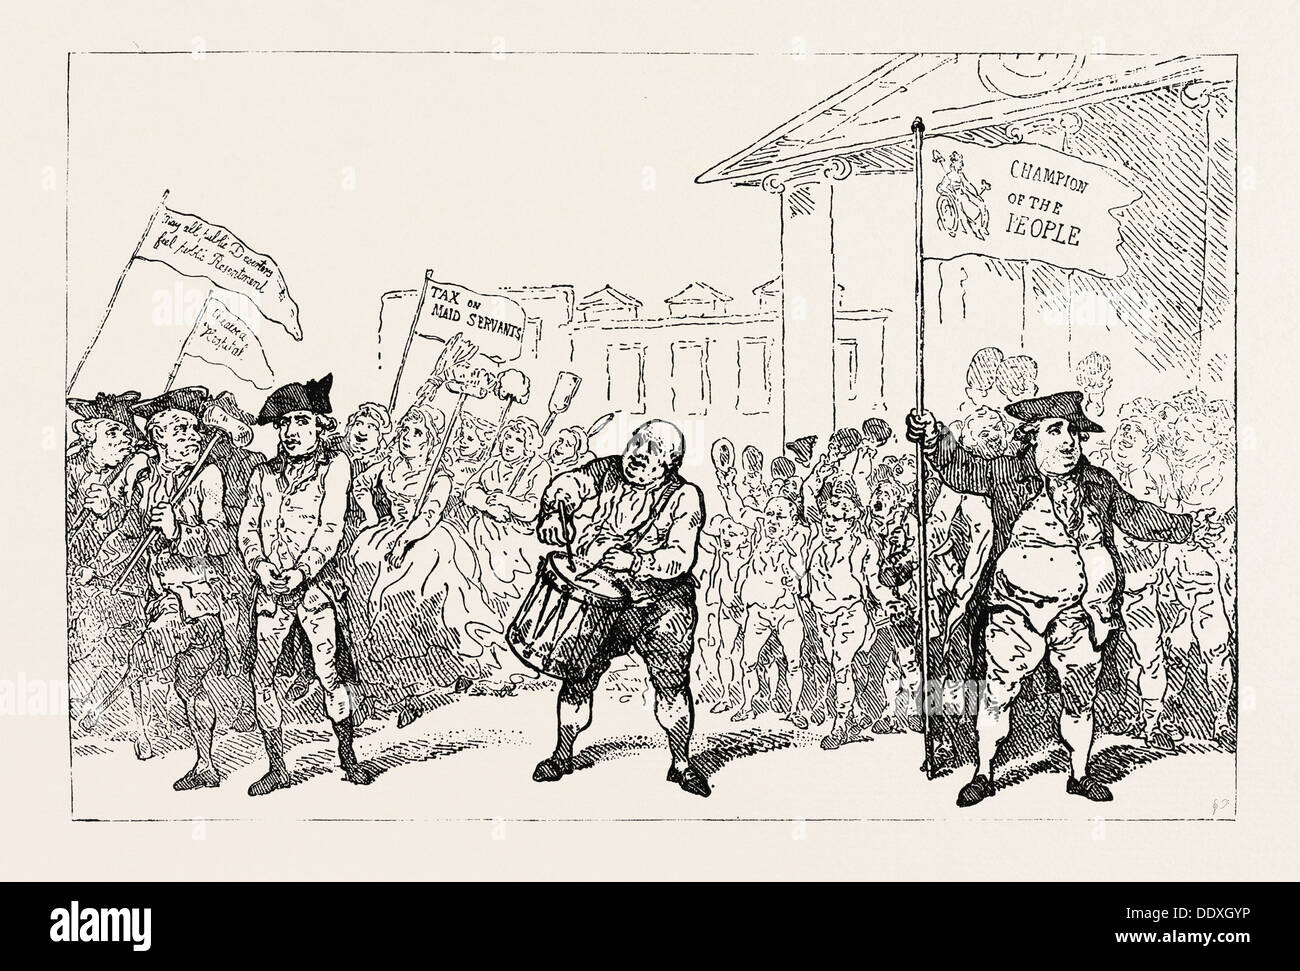 T. ROWLANDSON: THE WESTMINSTER DESERTER DRUMMED OUT OF THE REGIMENT - Stock Image